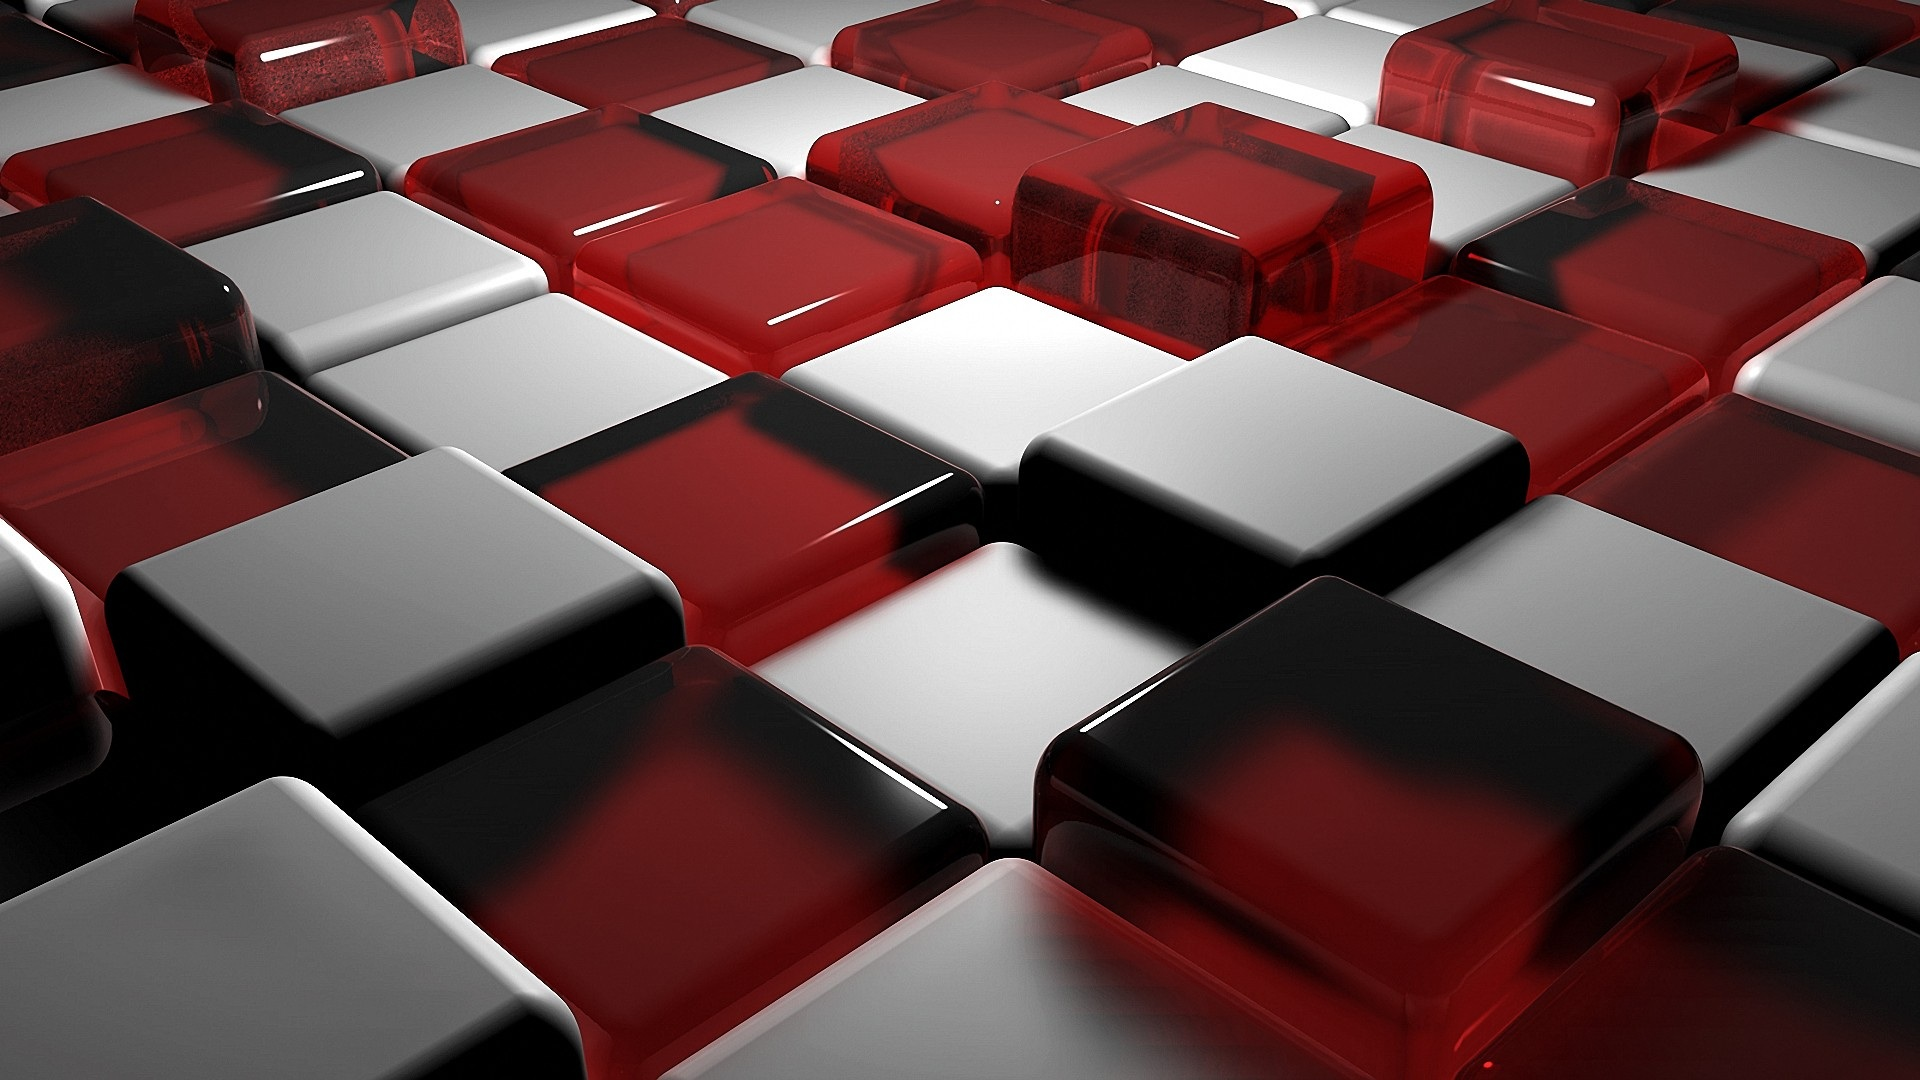 3D Cubes   Wallpaper 41507 1920x1080